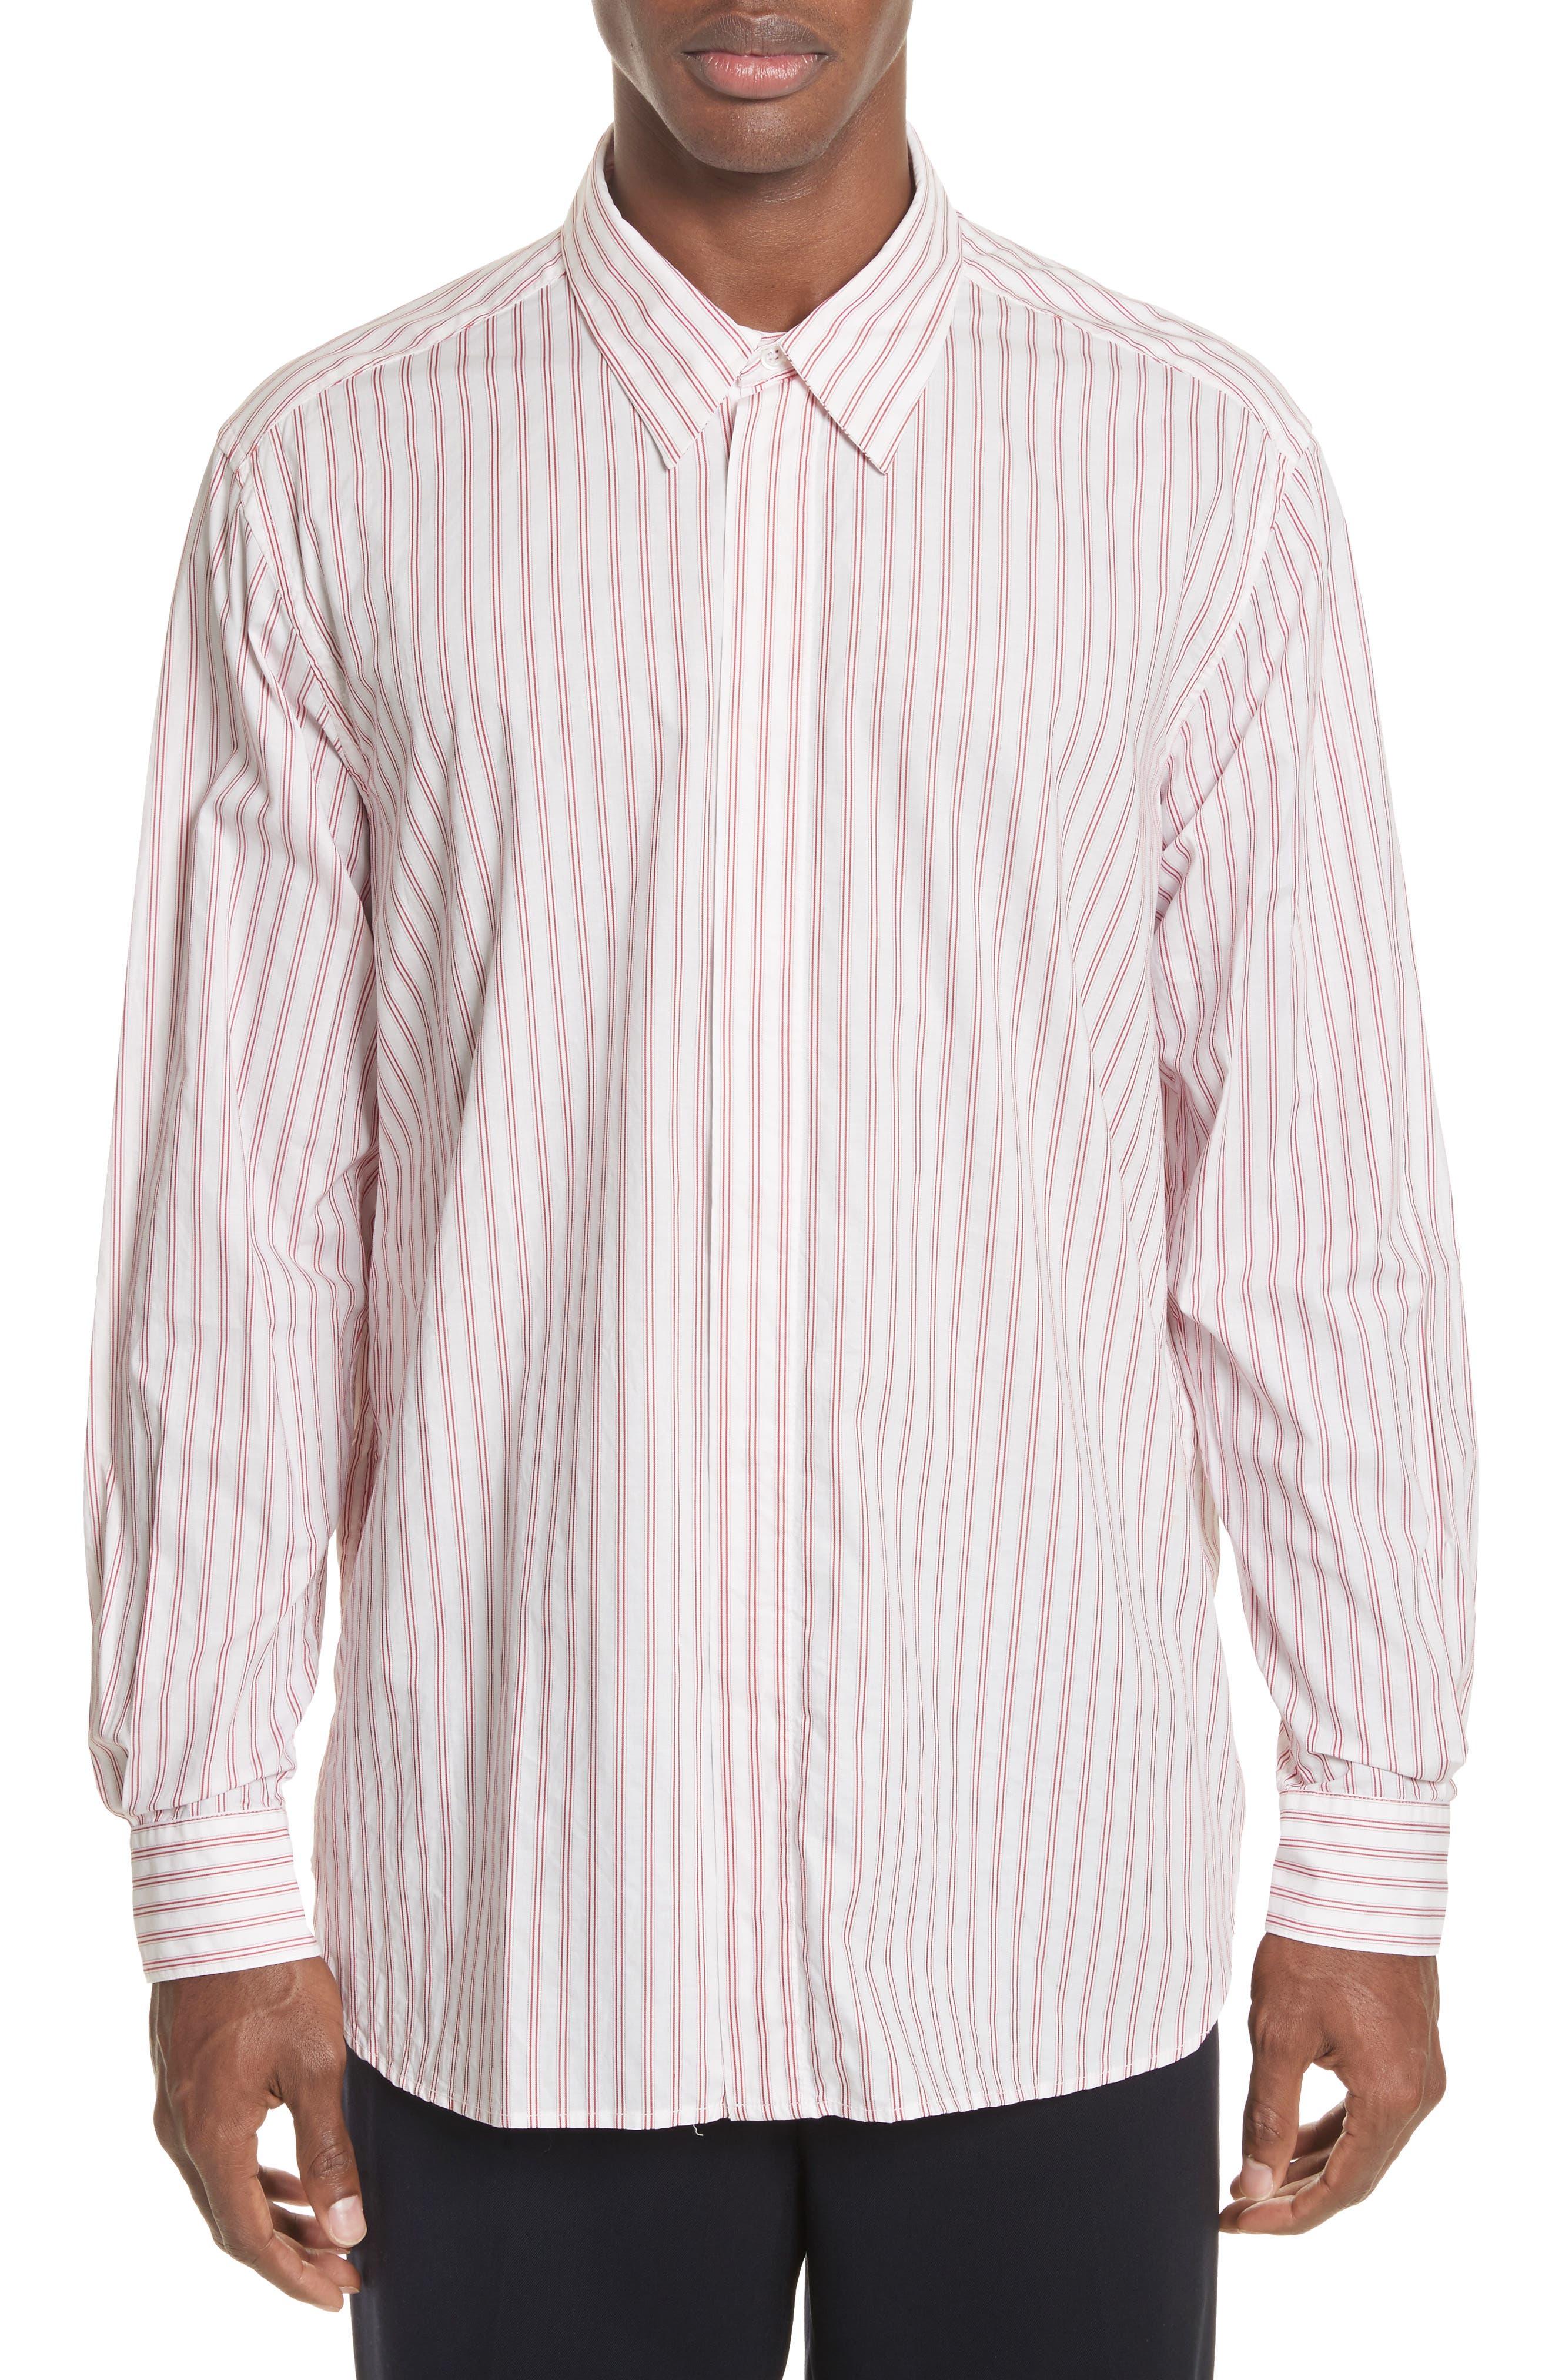 Aega Striped Sport Shirt,                         Main,                         color, 110